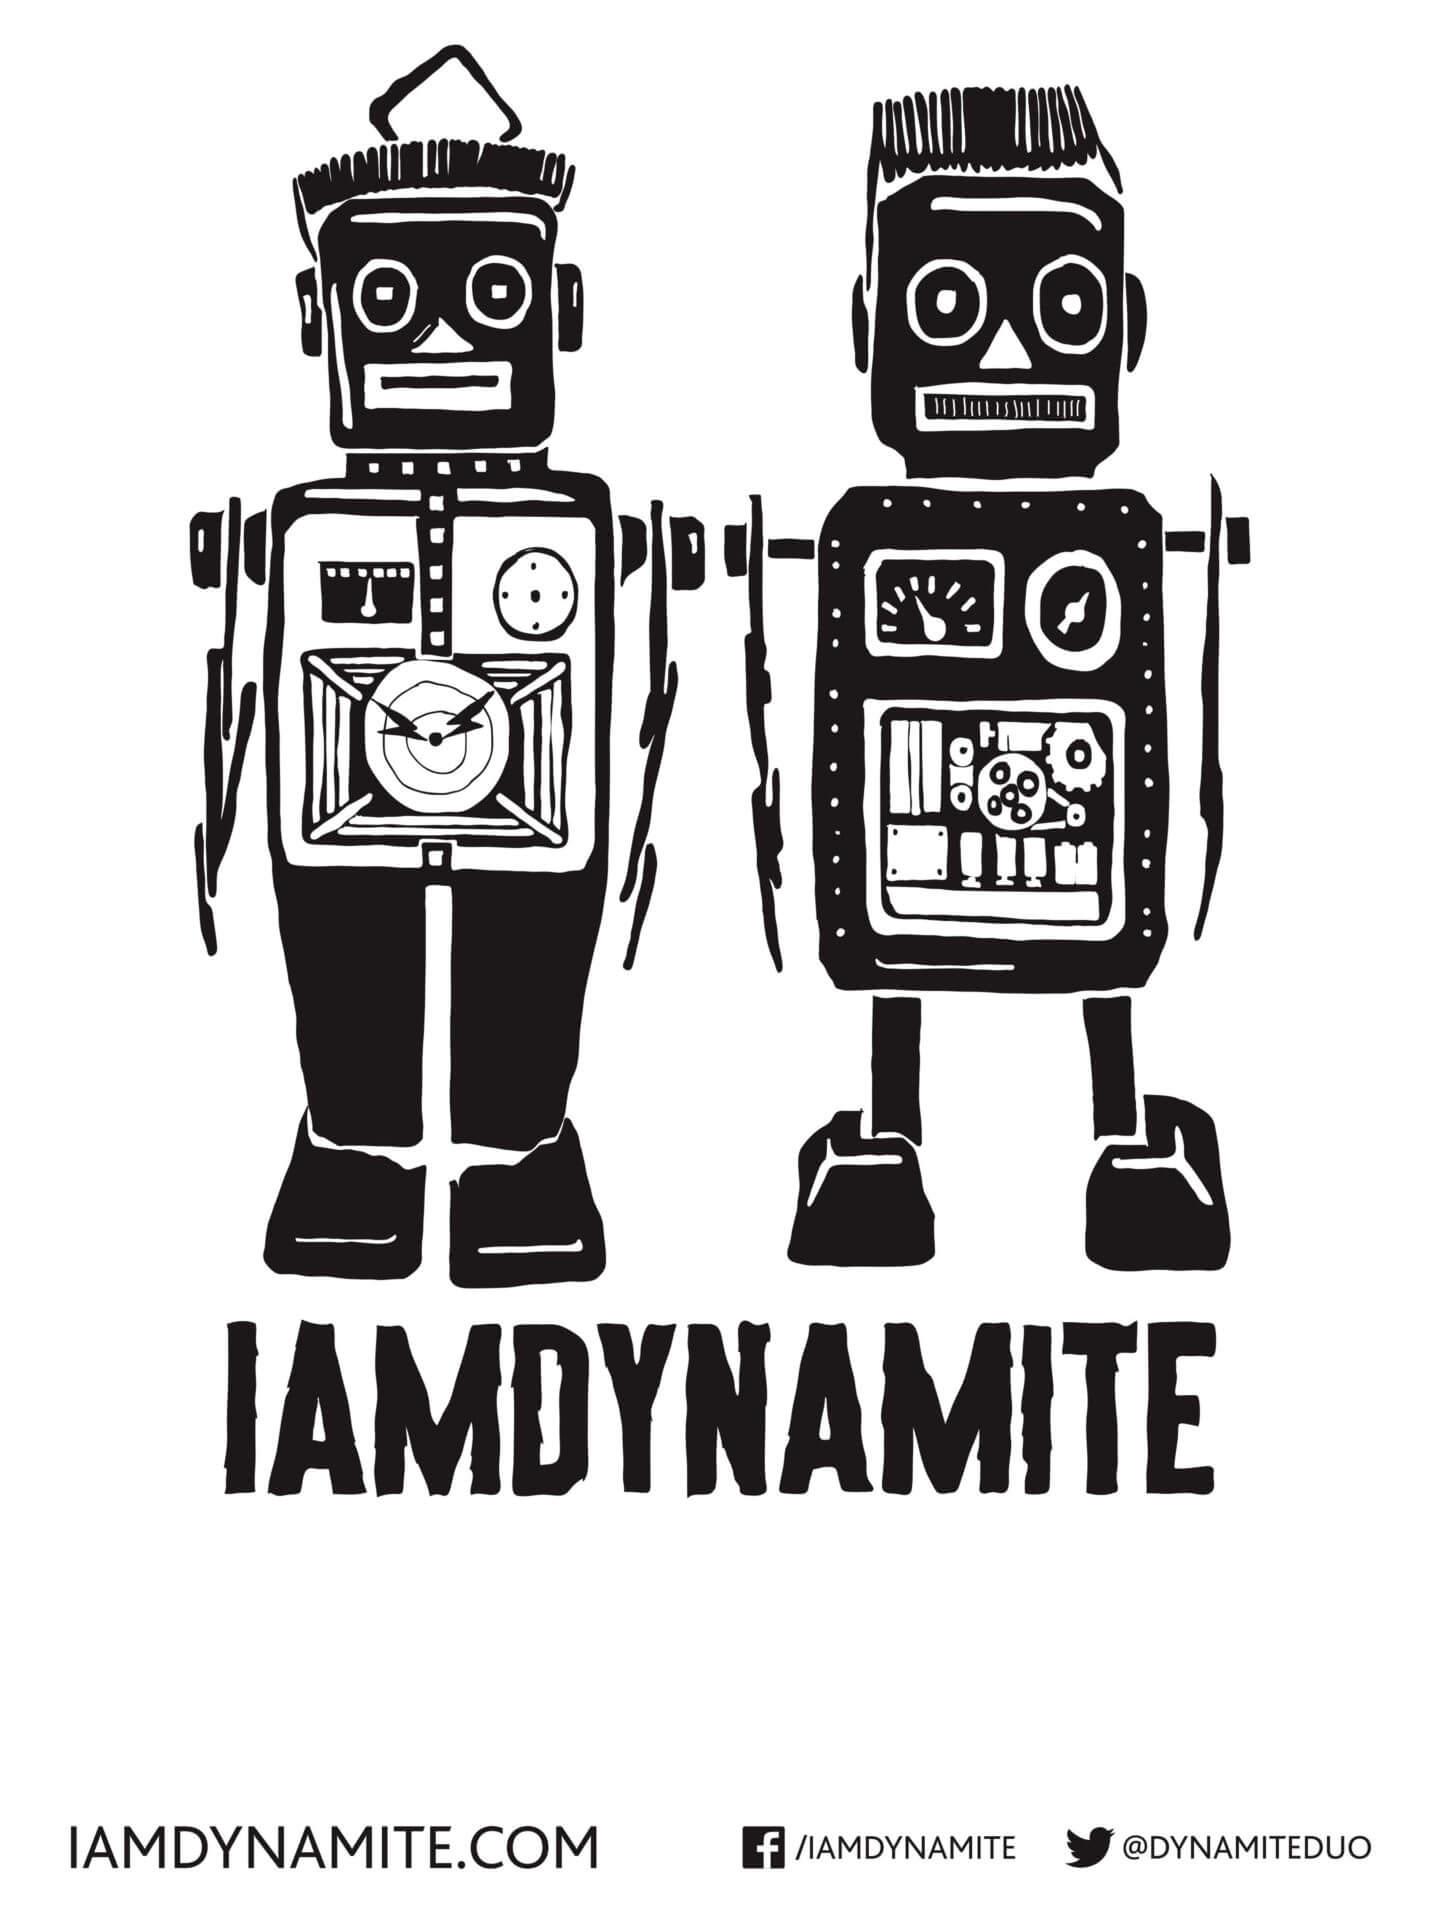 Iamdynamite on HiNOTE